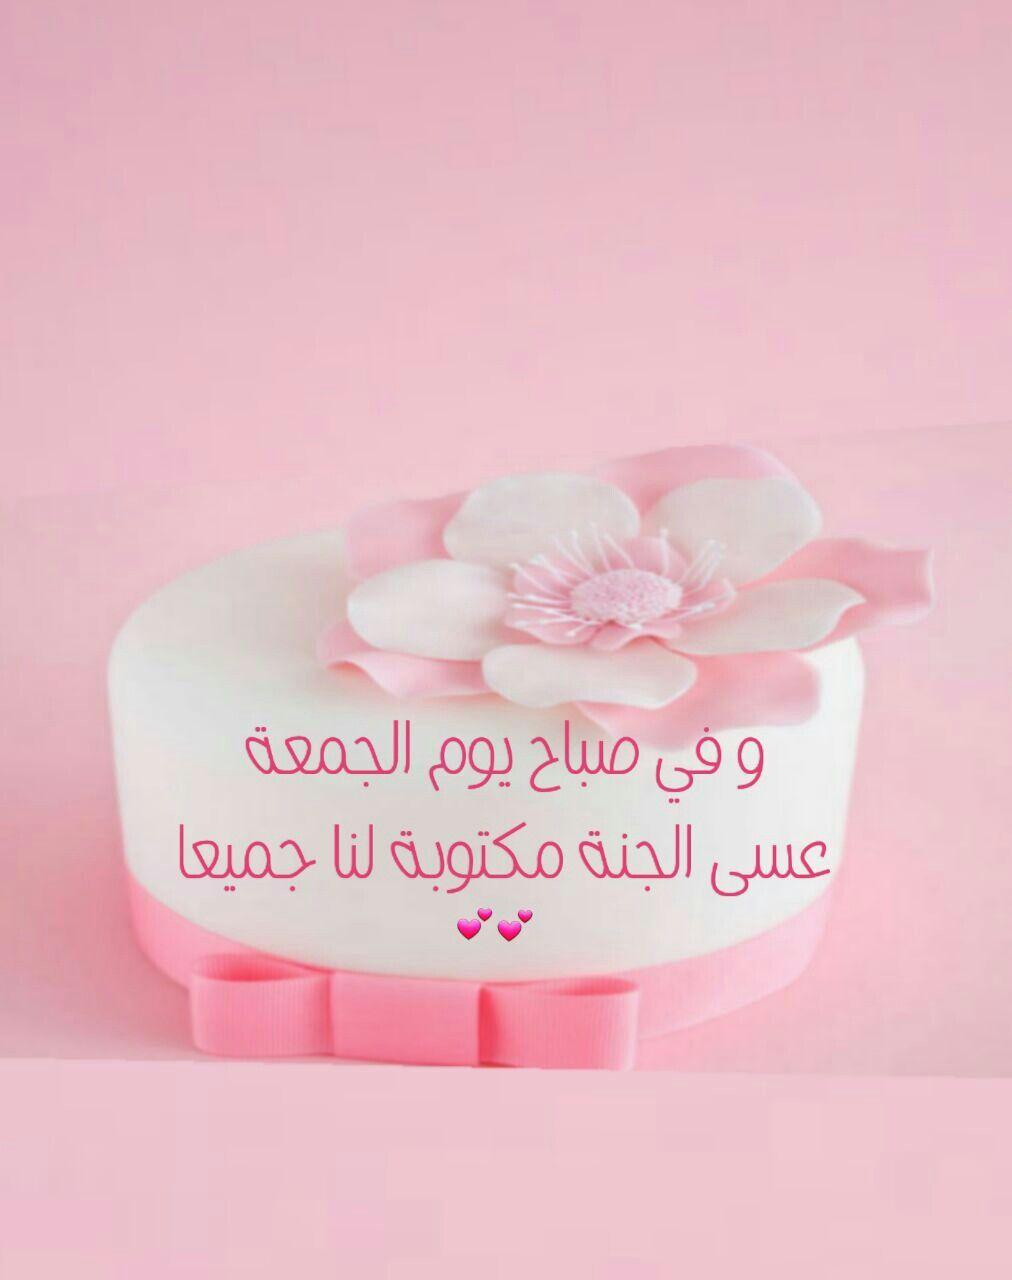 Pin By Shabnam Abrar On رسالة الجمعة Morning Wish Jumma Mubarak Islam